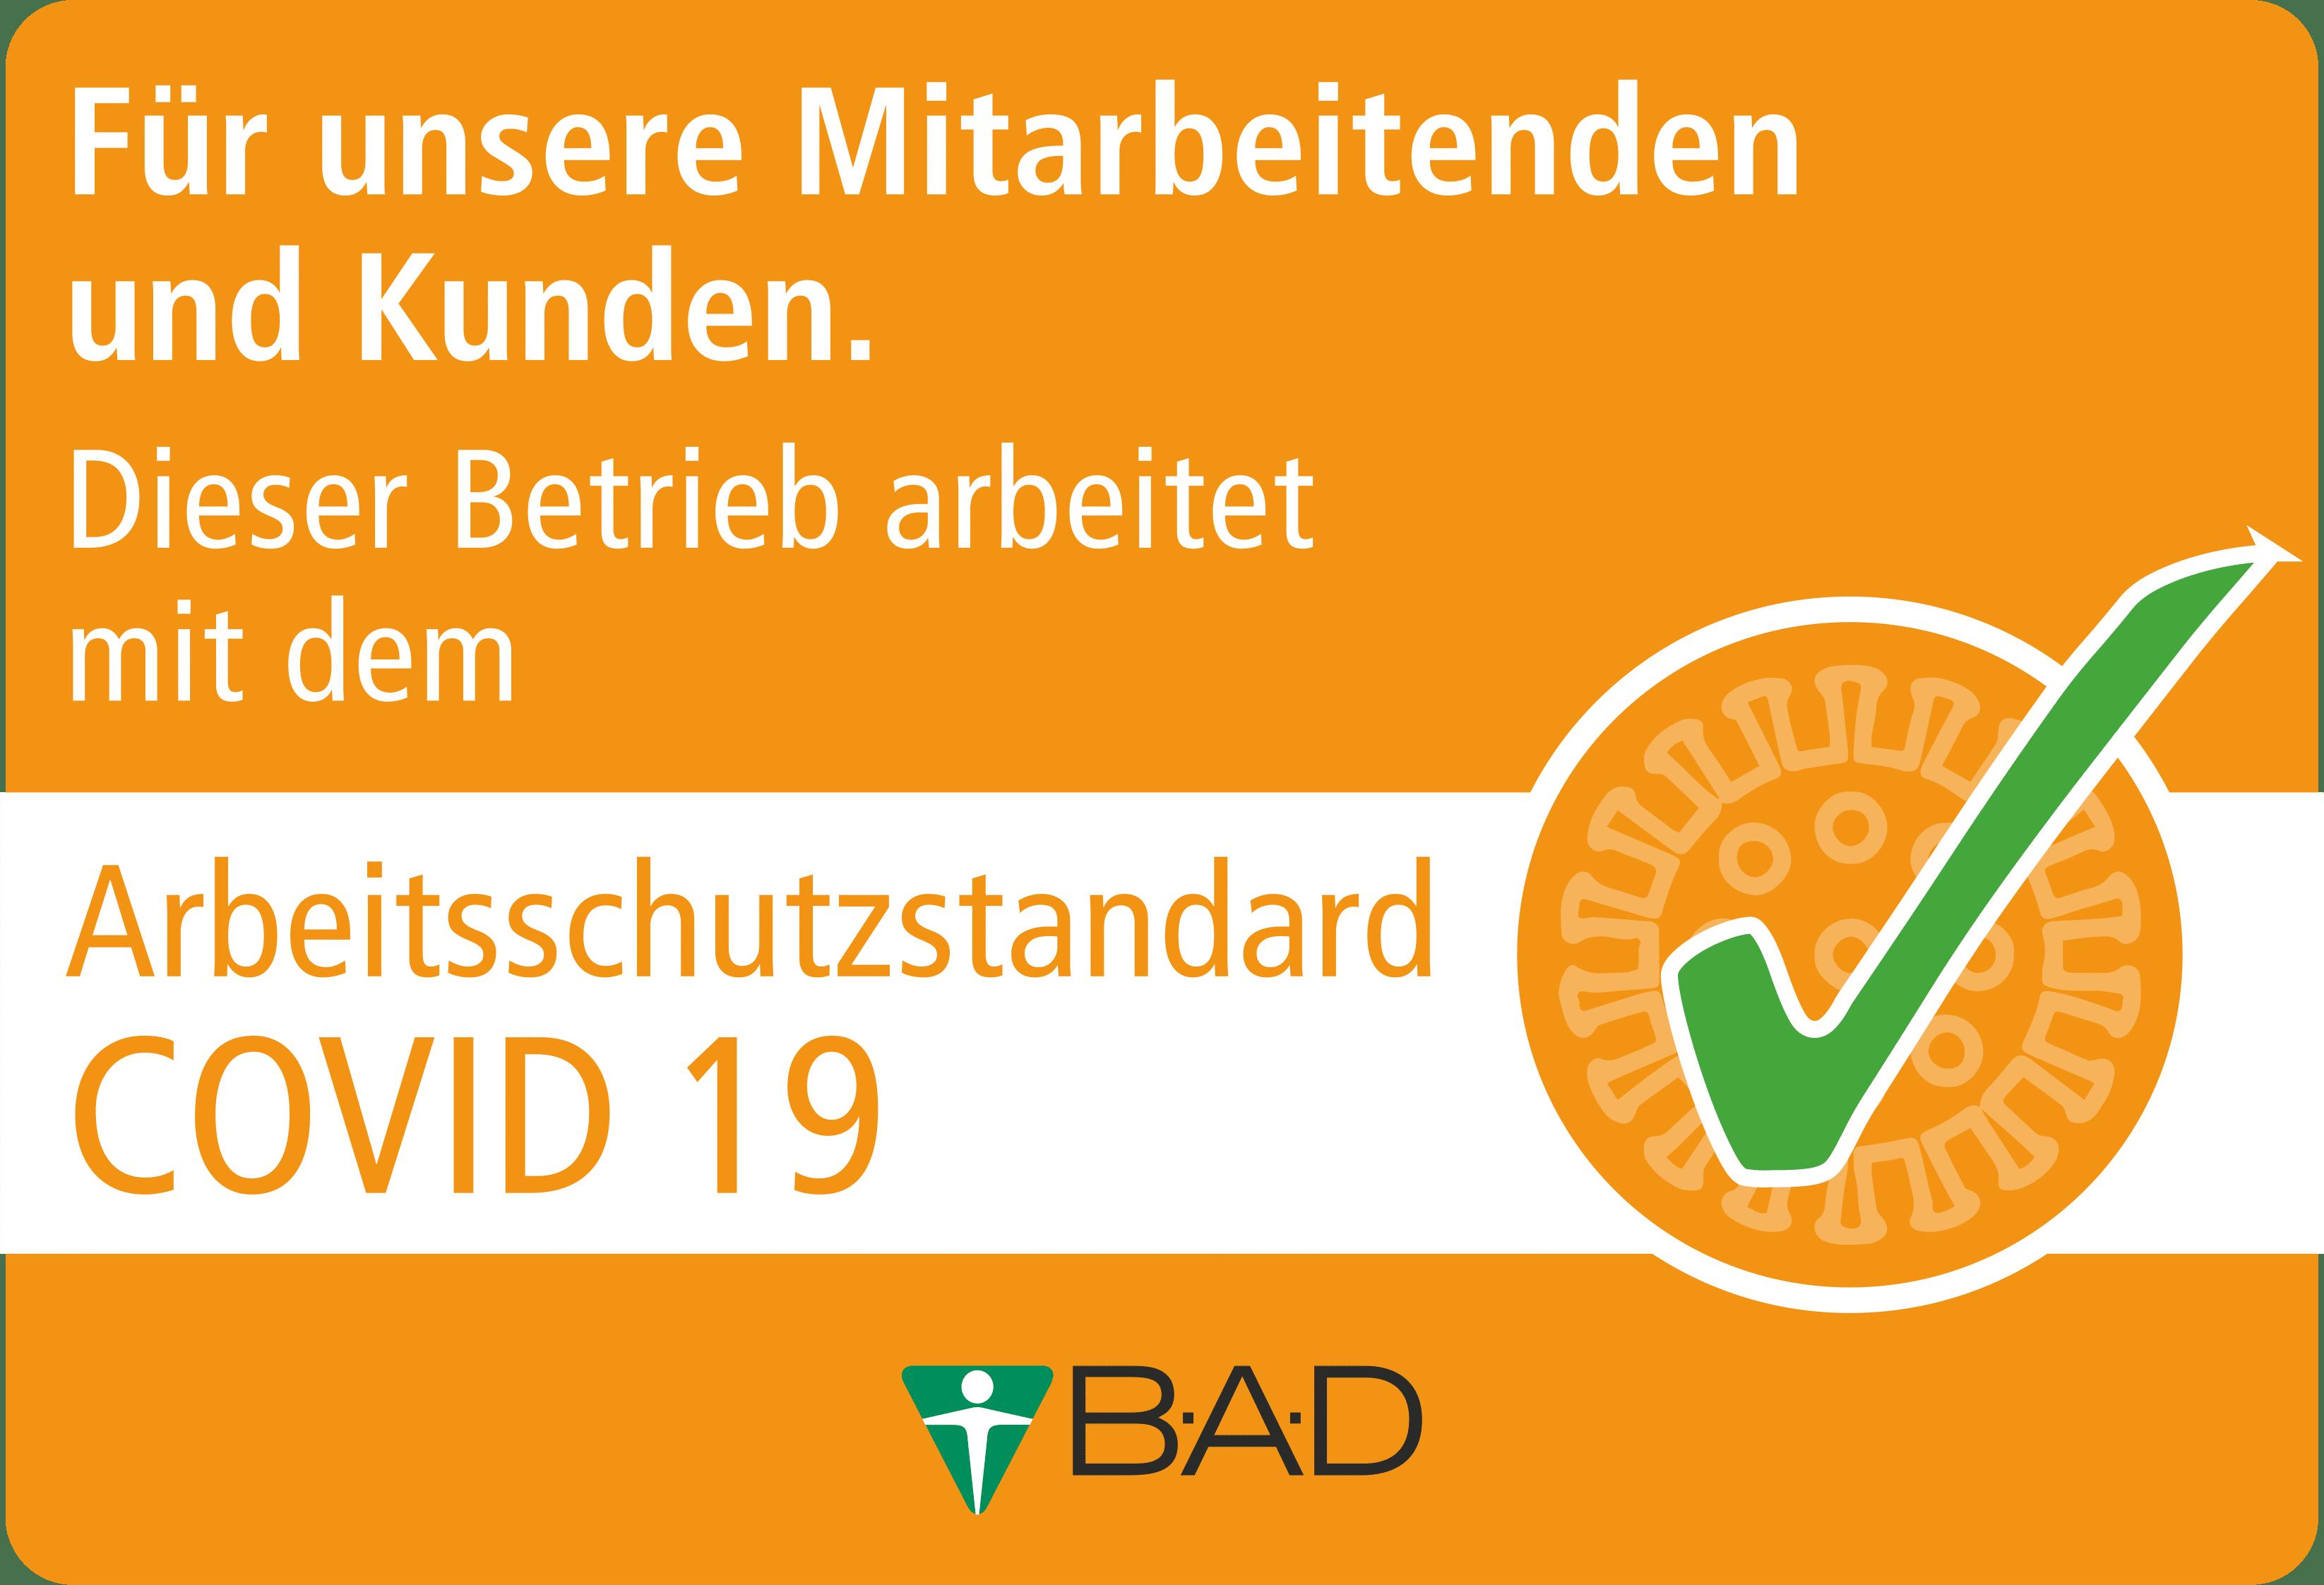 arbeitsschutzstandard-covid-19